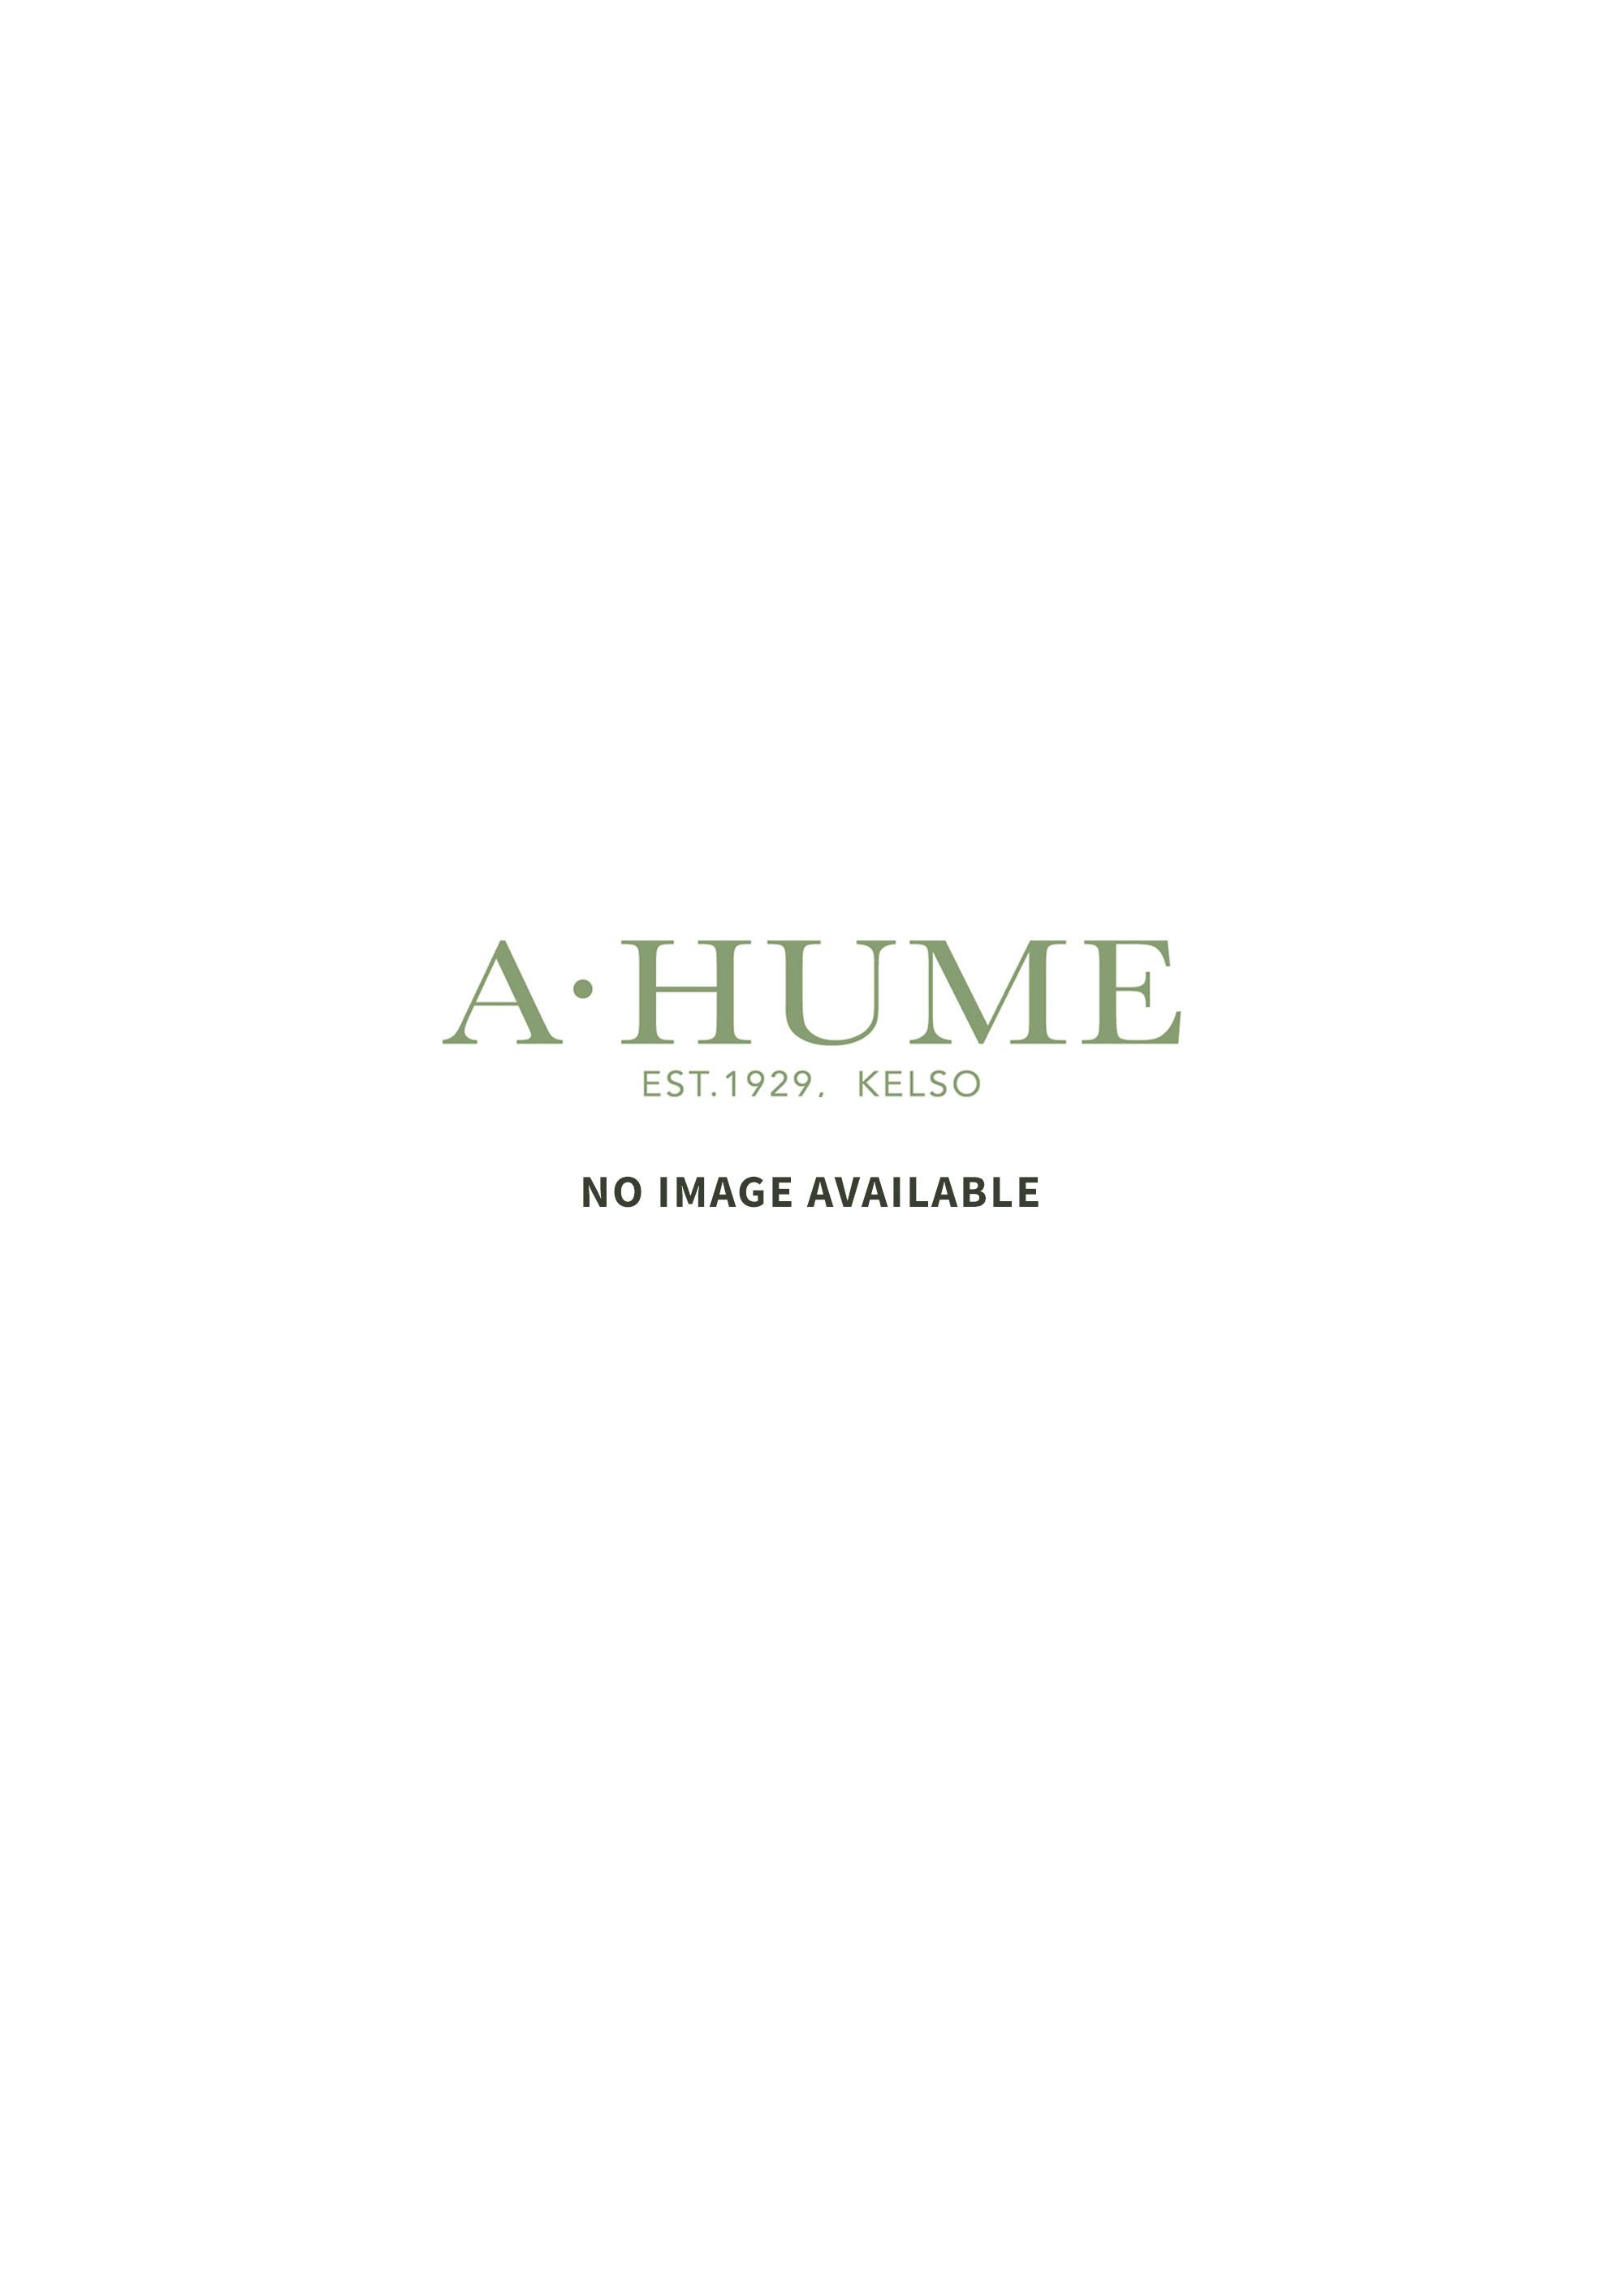 a6ca1221 Dubarry Dubarry Cap- A Hume